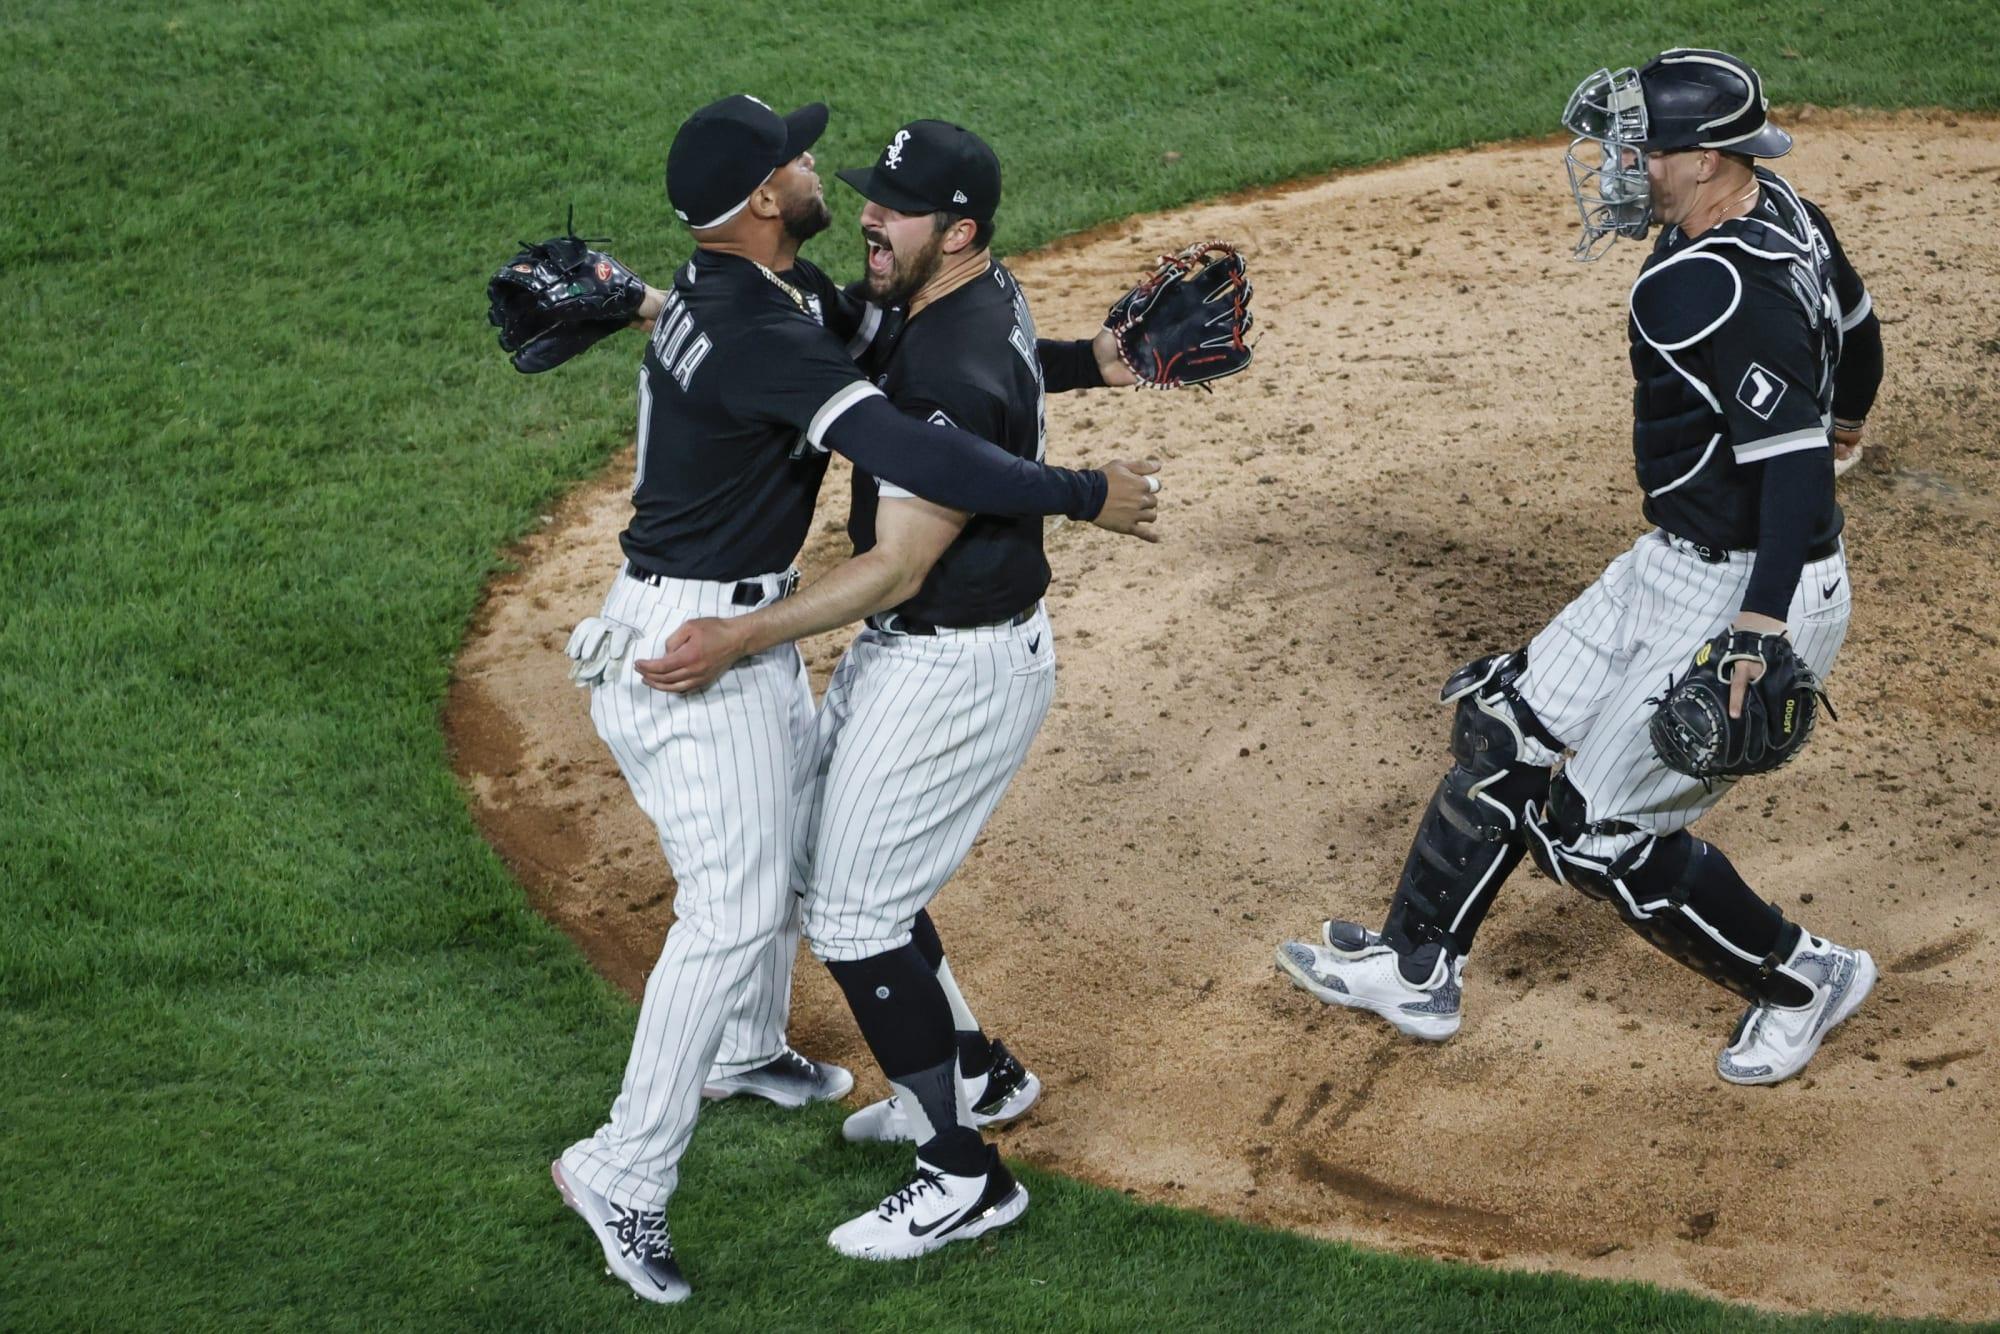 Listen: Len Kasper's radio call of Carlos Rodon's no-hitter is beautiful baseball bliss